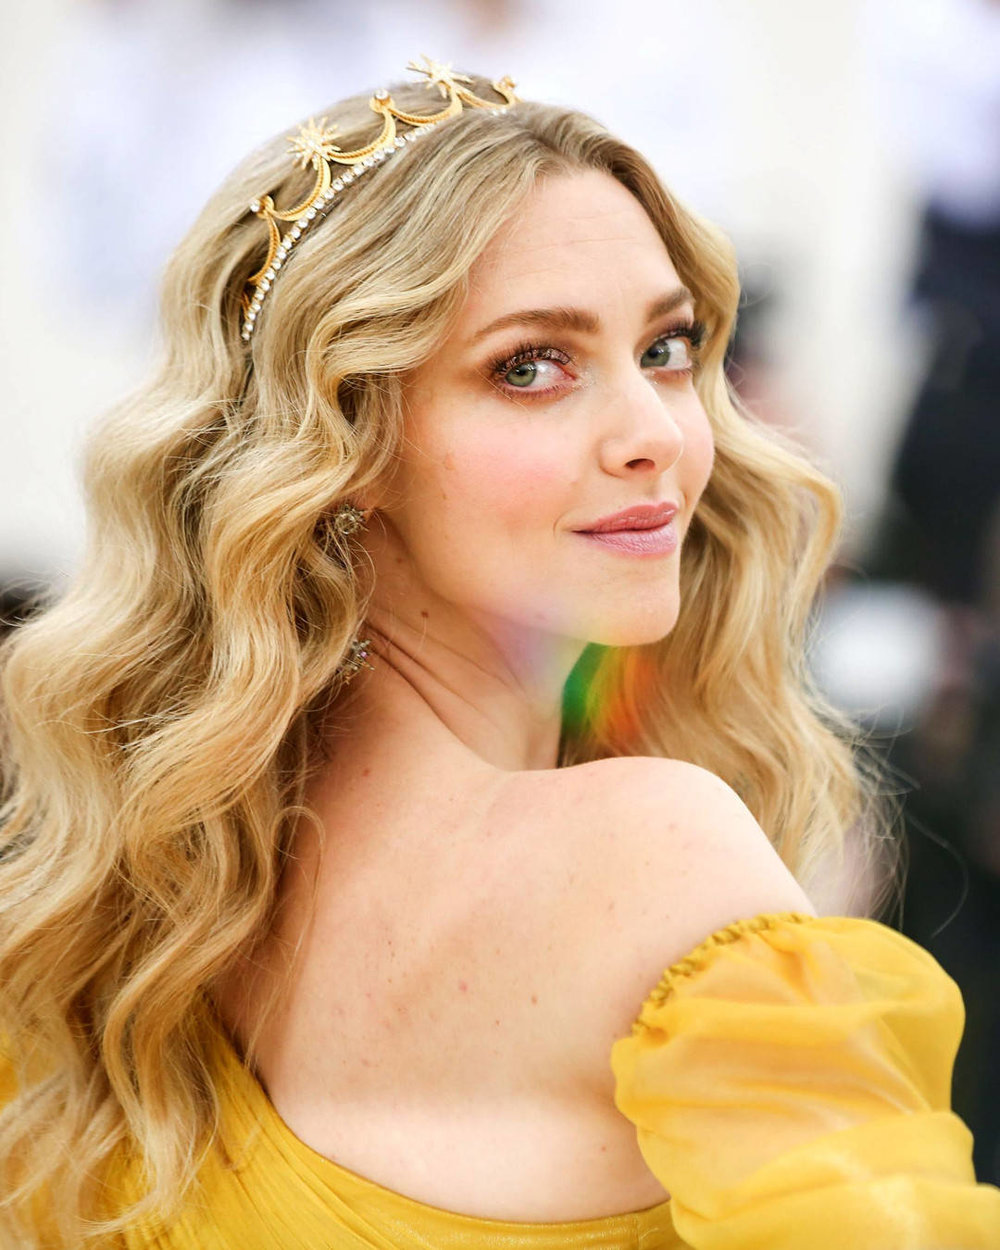 rs_1080x1350-180507214858-1080x1350-Amanda-Seyfried-Met-Gala-Best-Beauty.jpg